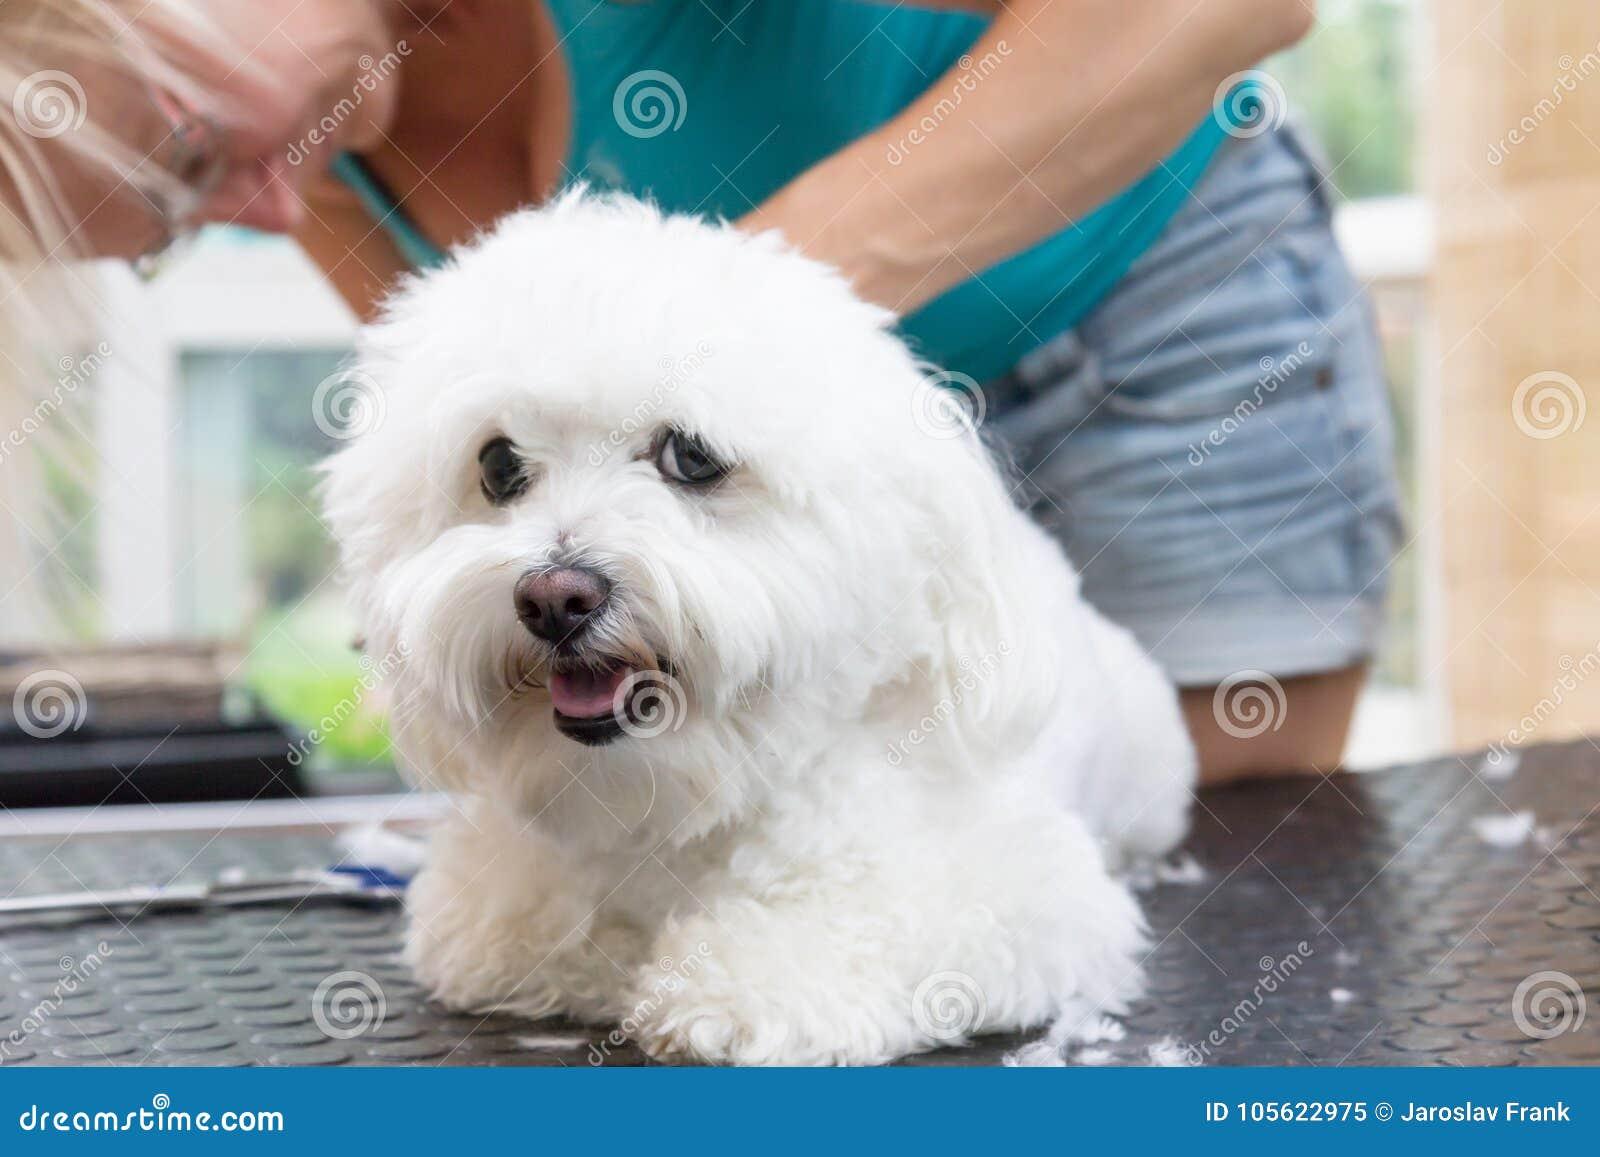 De leuke witte Bolognese hond is verzorgd liggend op de lijst